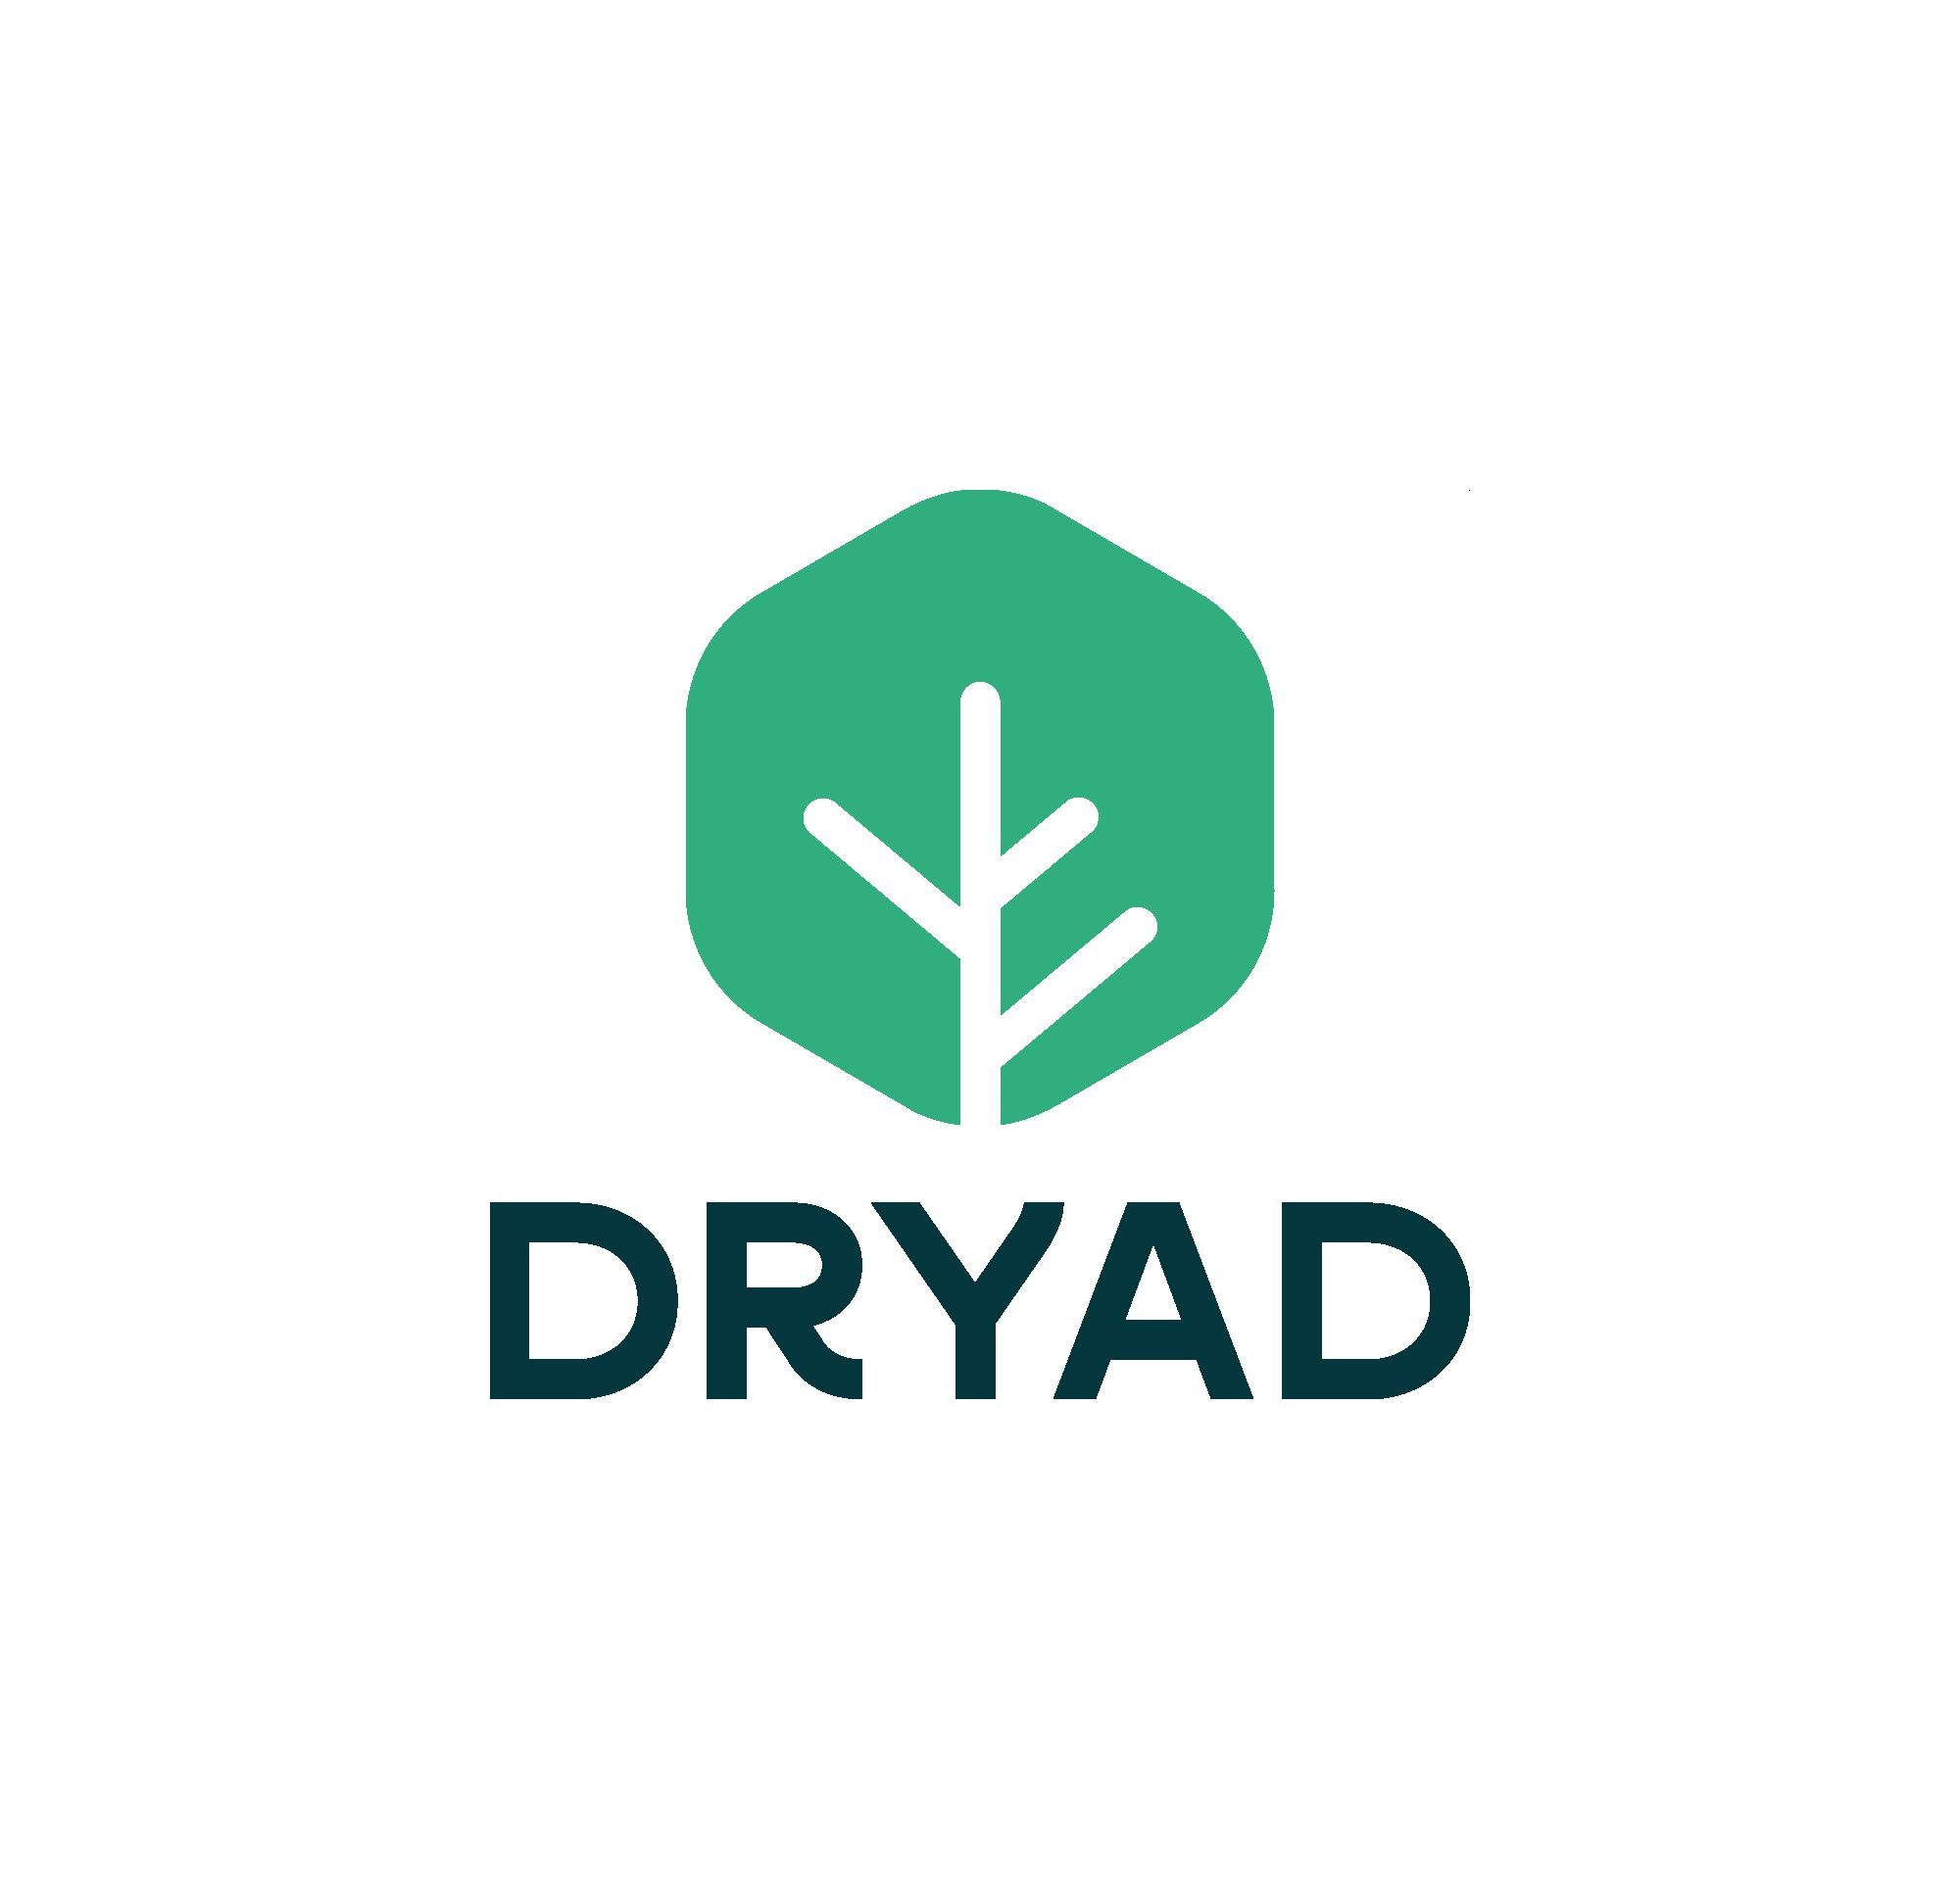 Dryad Networks's logo